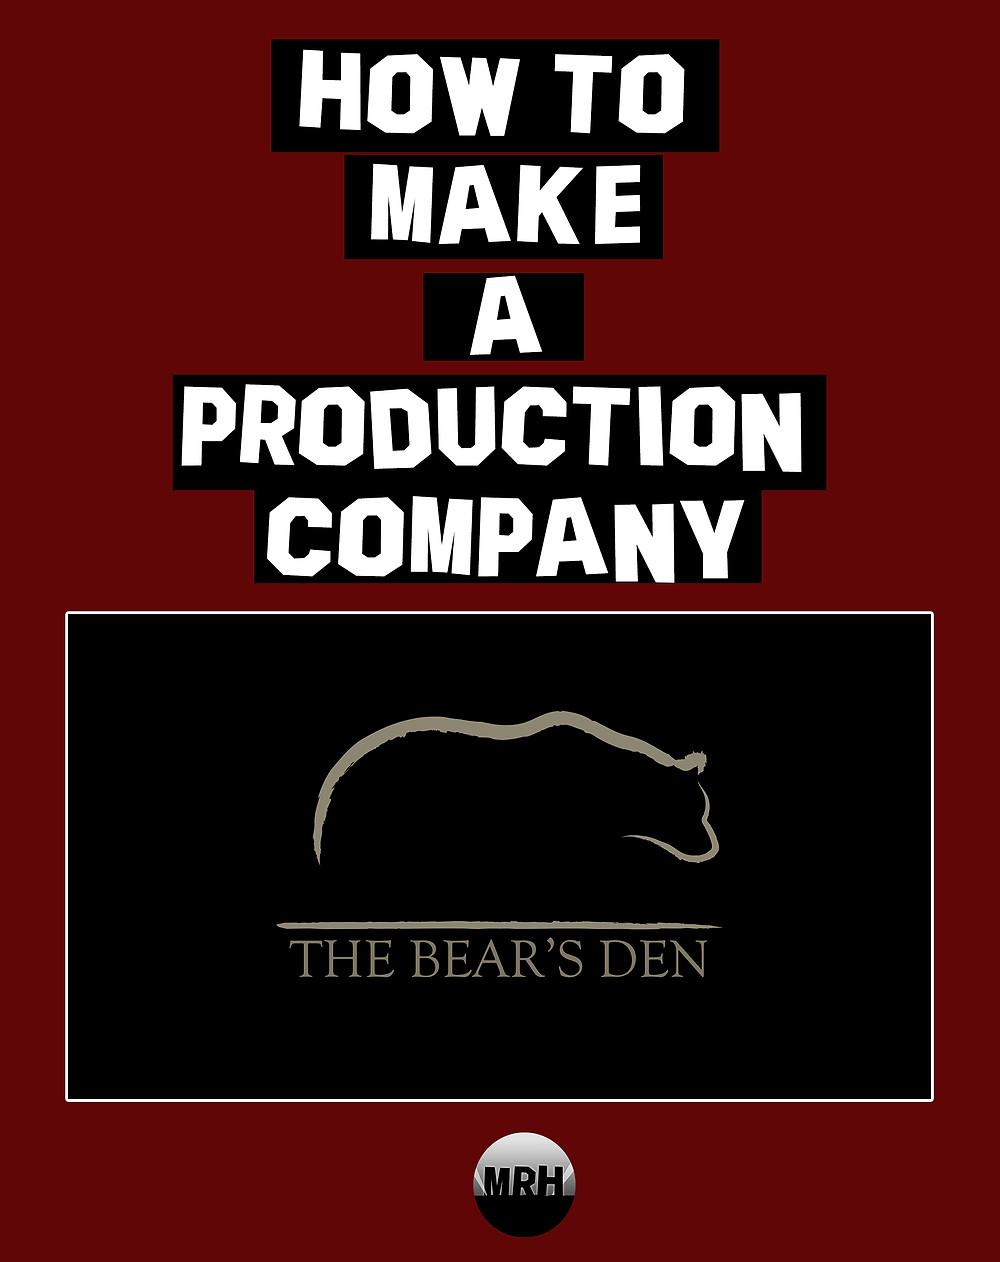 How To Make A Production Company